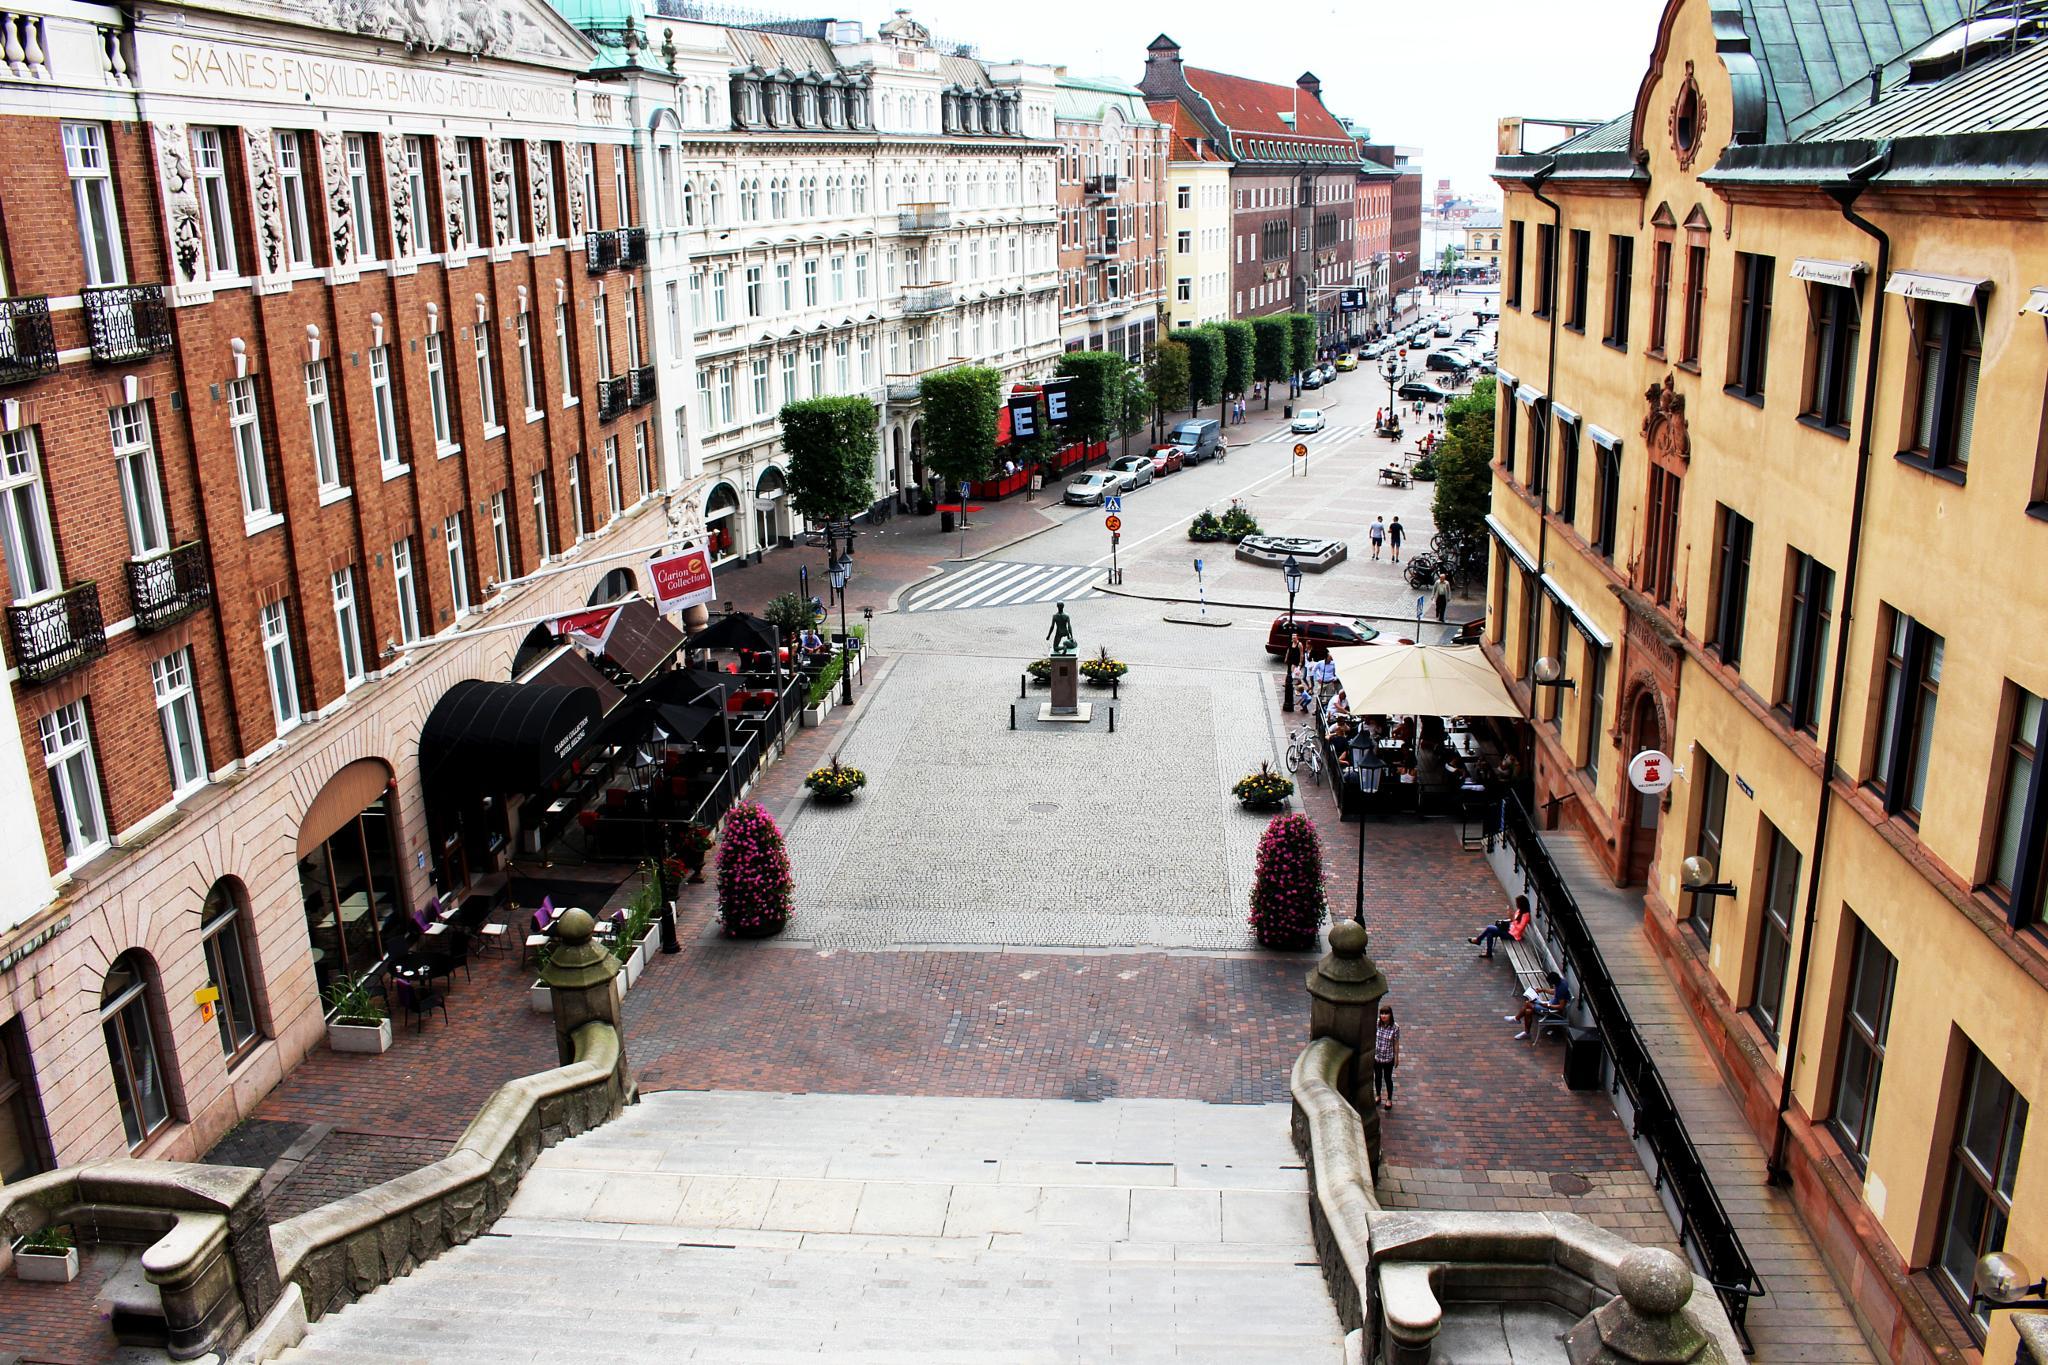 Helsingborg, Sweden by Cristiana Iacob